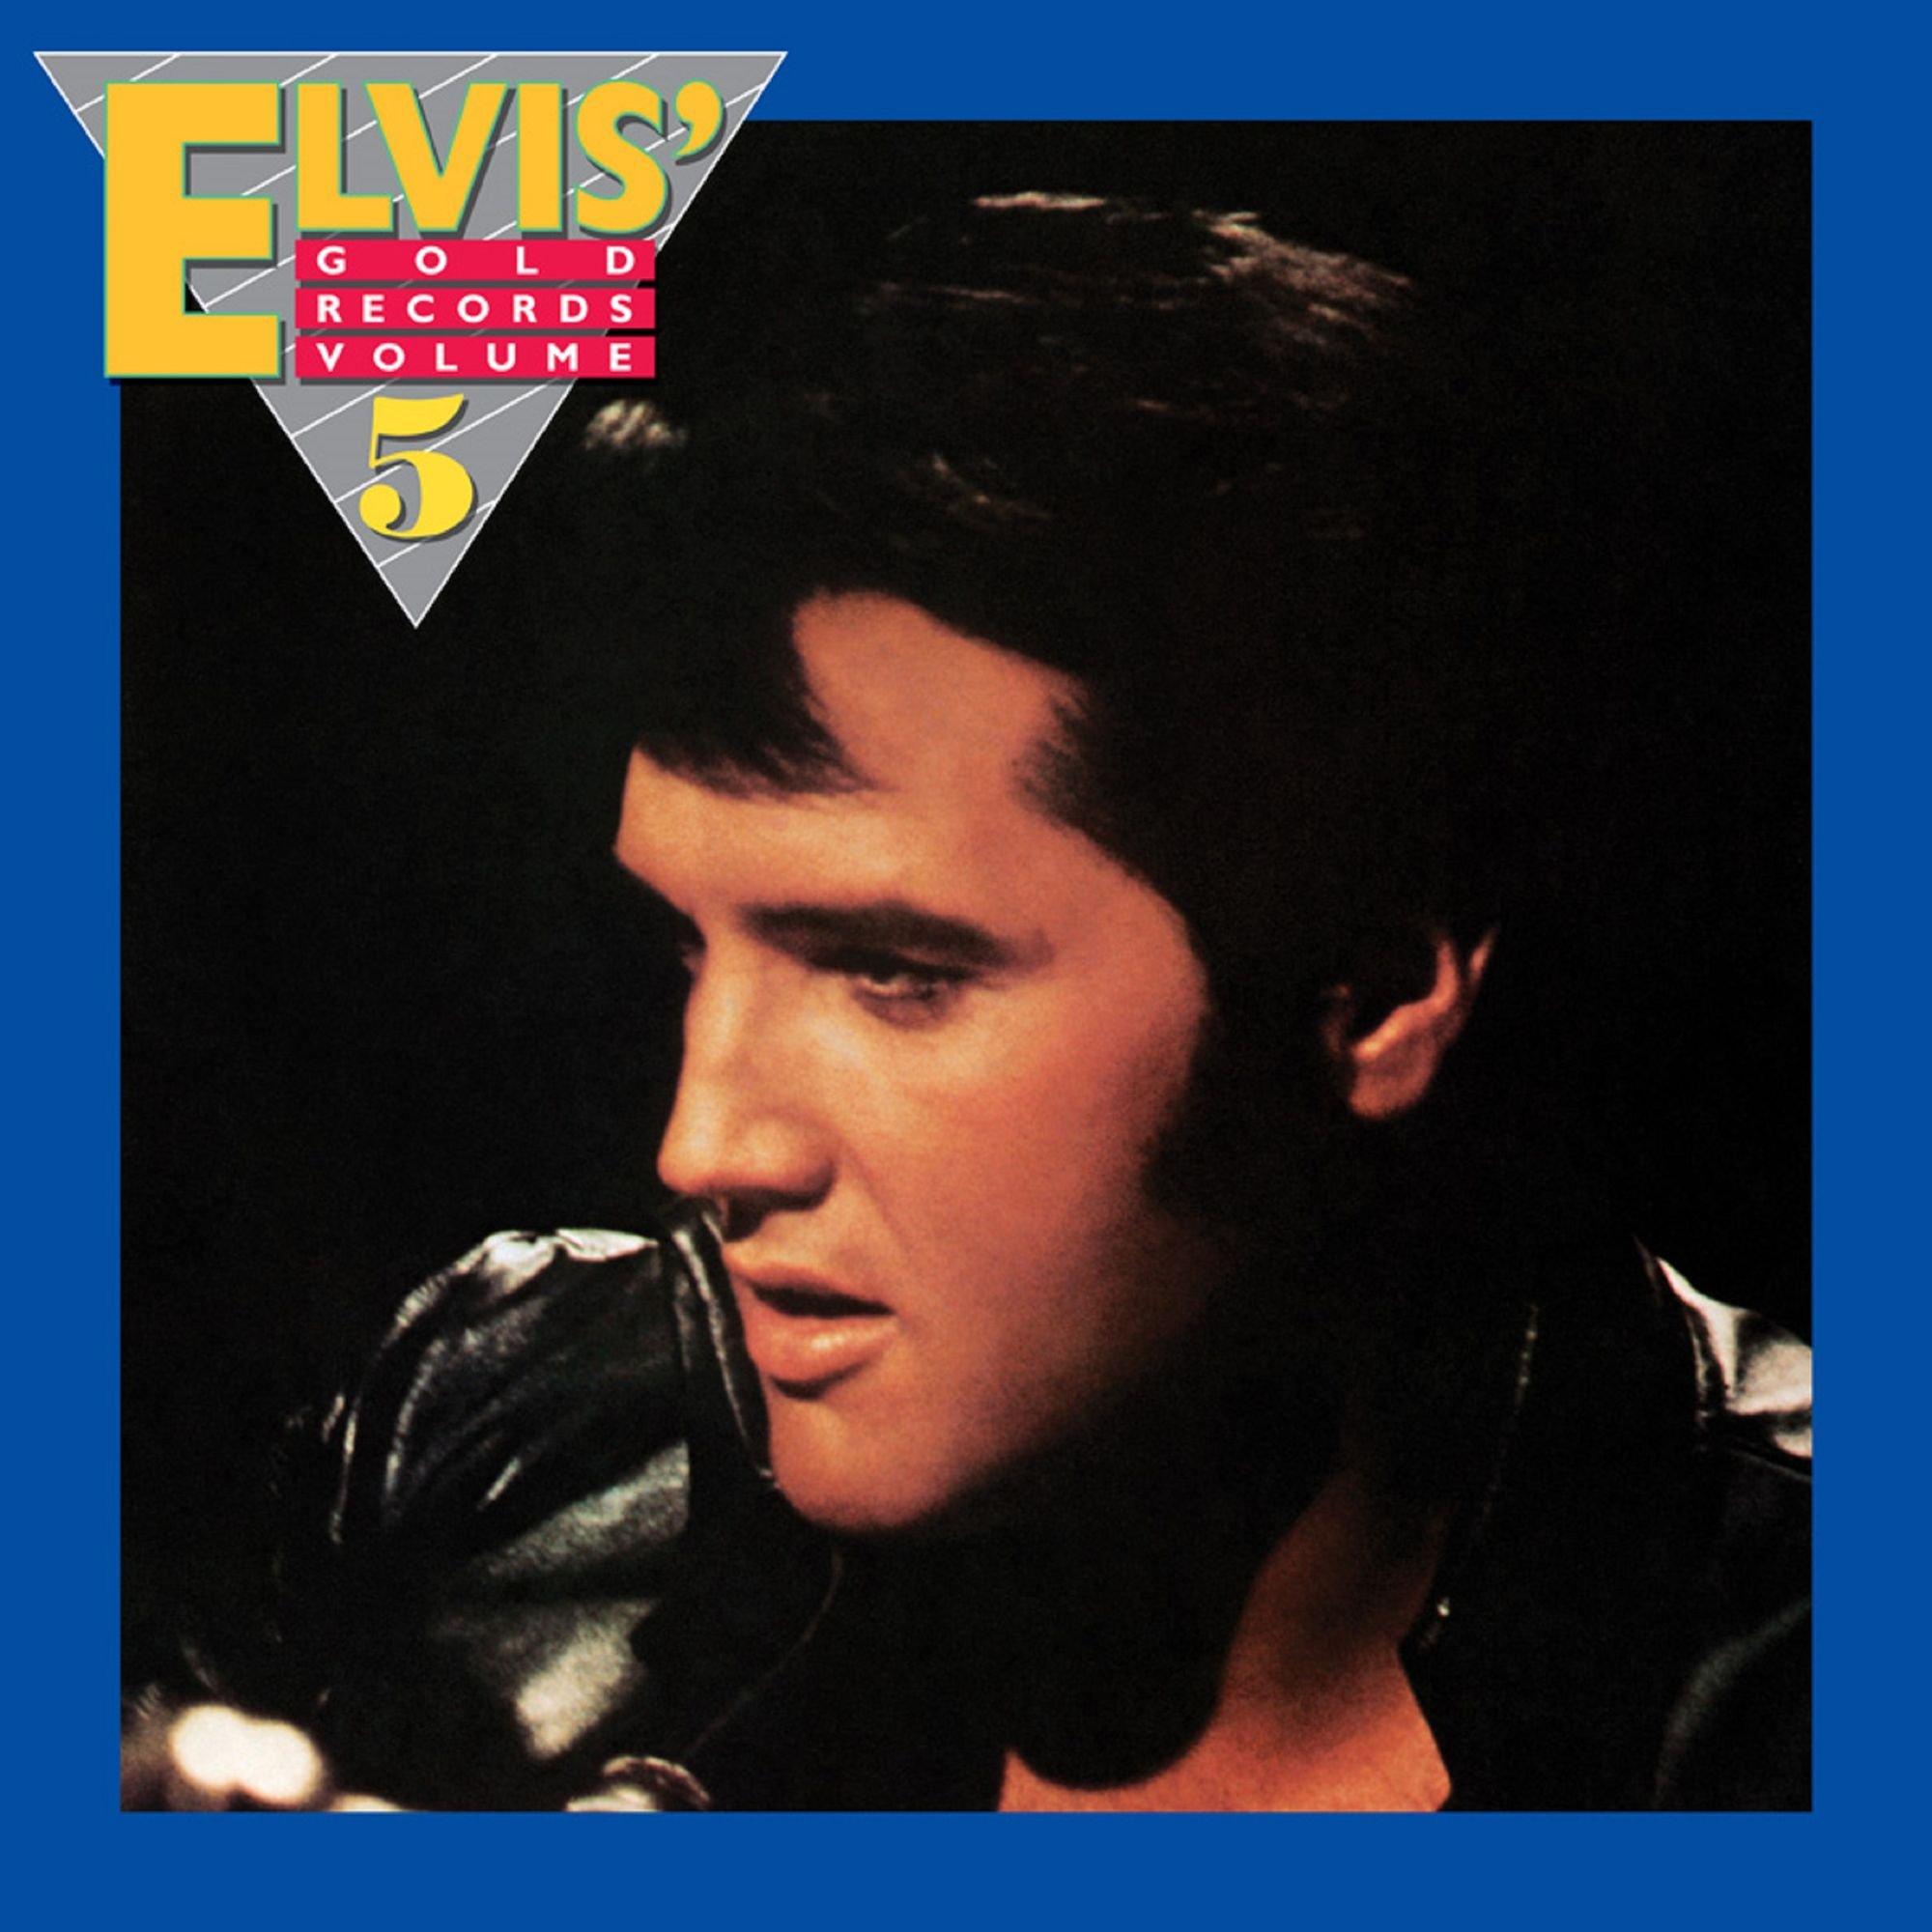 Vinilo : Elvis Presley - Elvis' Gold Records 5 (180 Gram Vinyl, Gatefold LP Jacket, Limited Edition, Anniversary Edition)